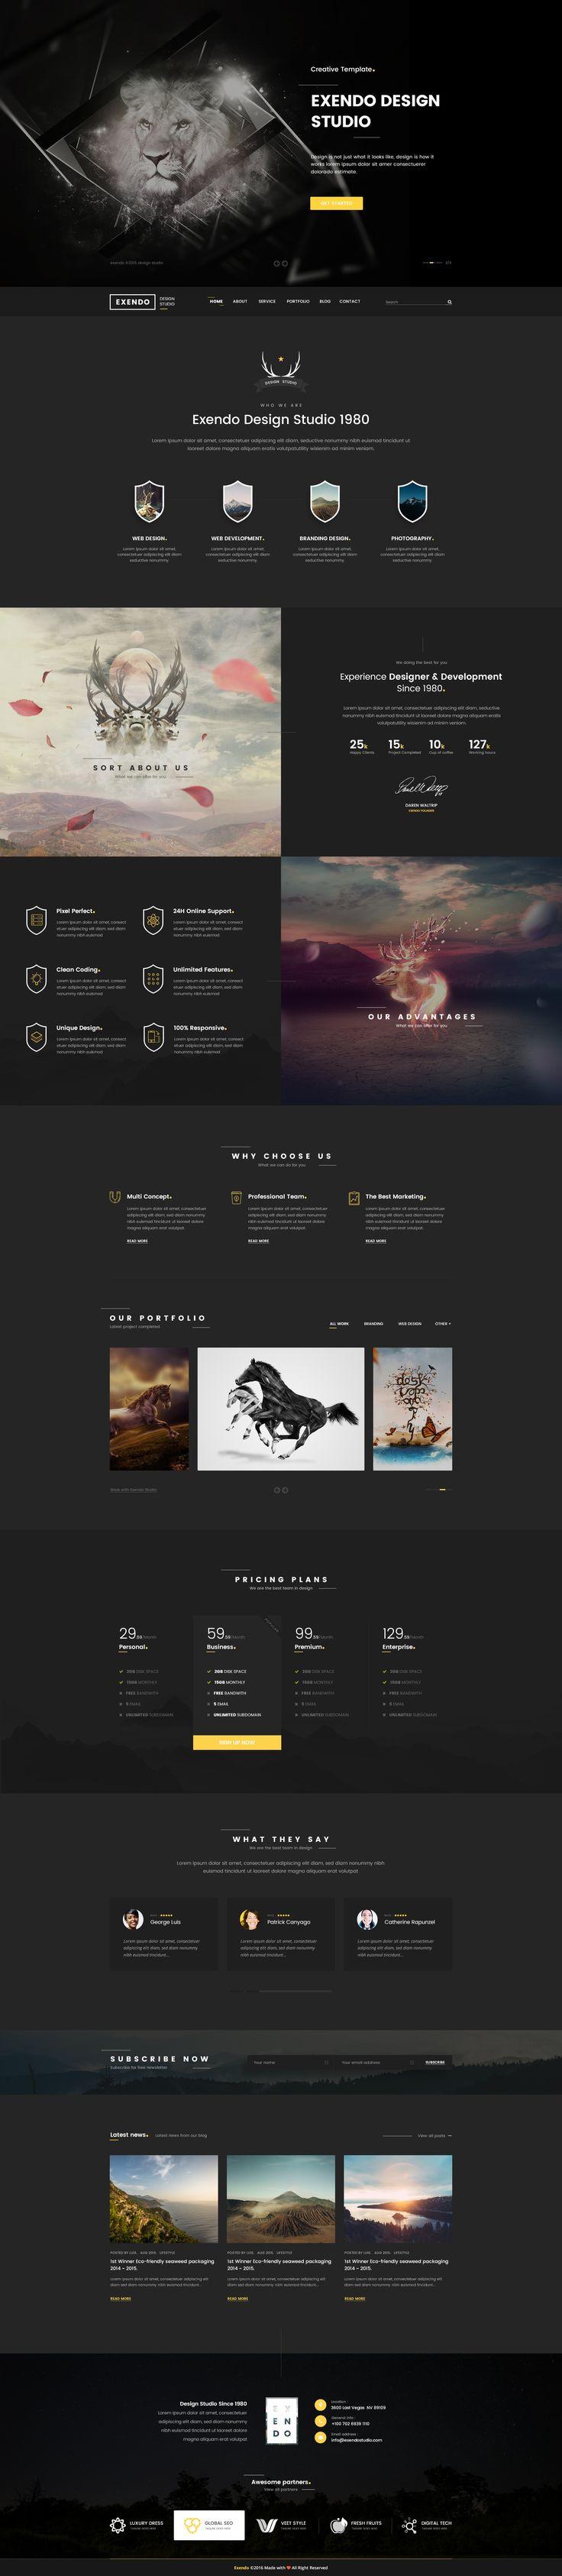 Exendo - Creative PSD Template #web design #template #clean • Download ➝ https://themeforest.net/item/exendo-creative-psd-template/16993581?ref=pxcr